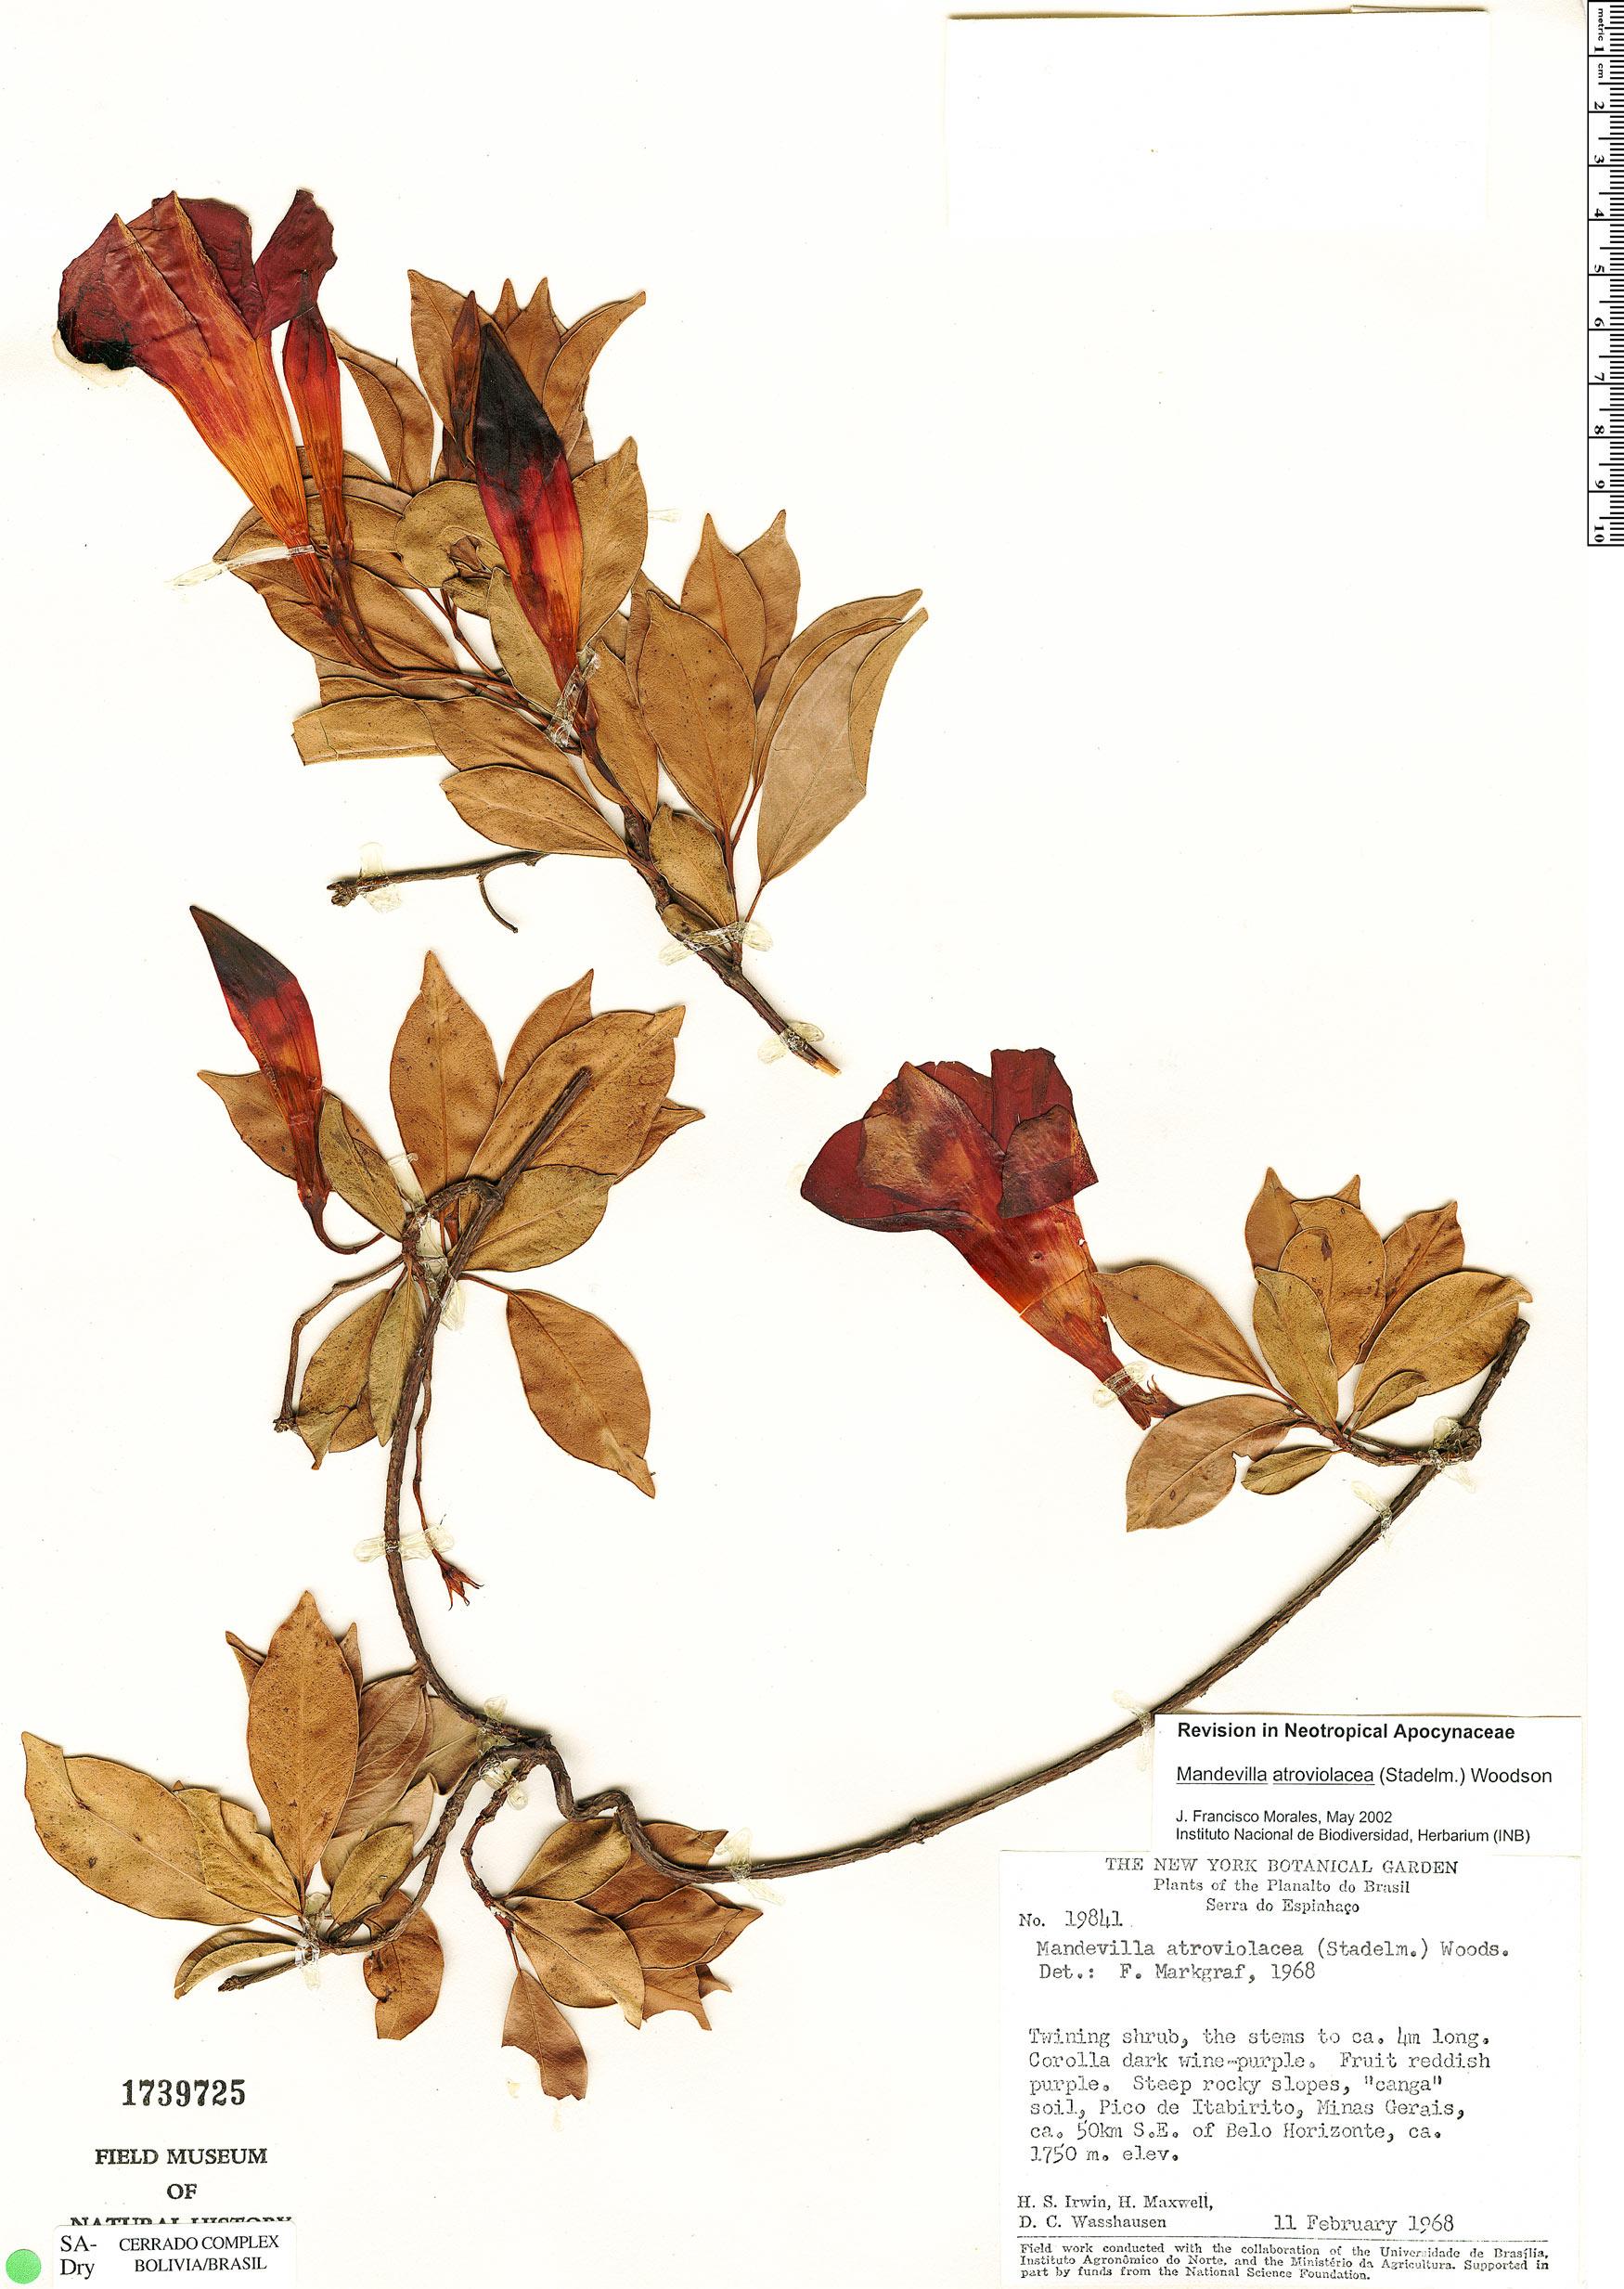 Specimen: Mandevilla atroviolacea